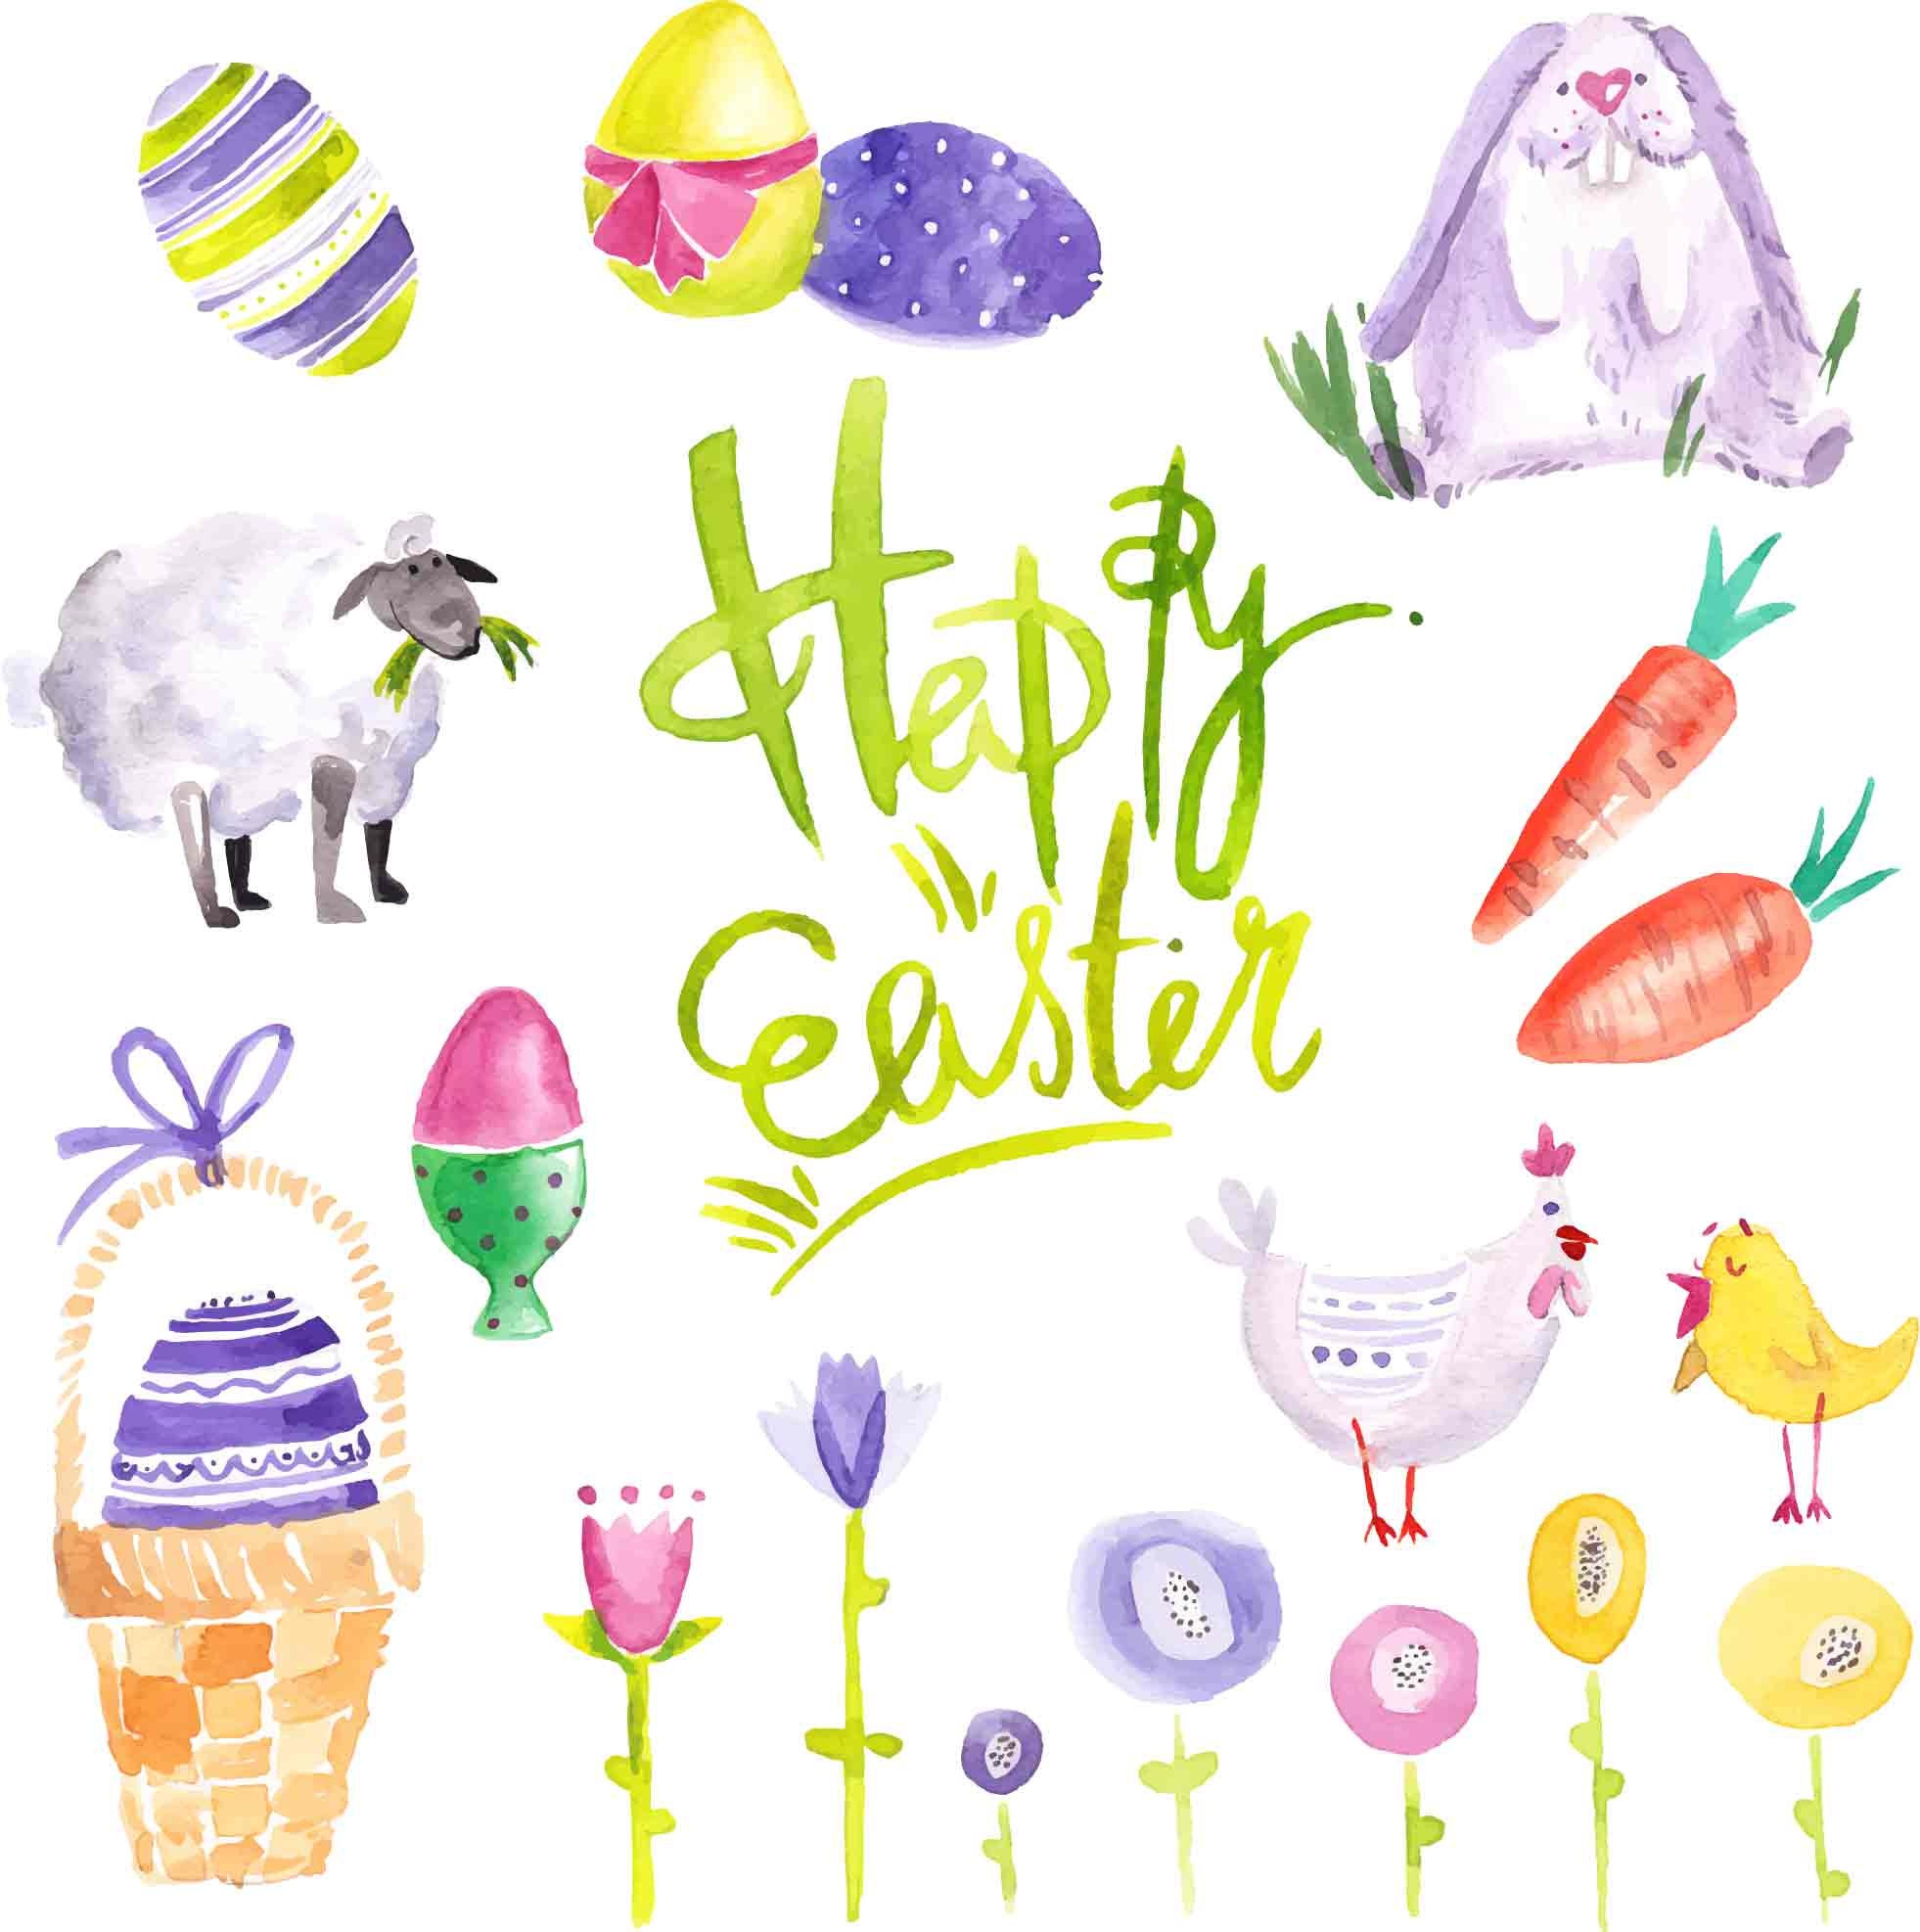 220 Best Easter Graphics in 2020: Free & Premium - design tnt vector watercolor easter